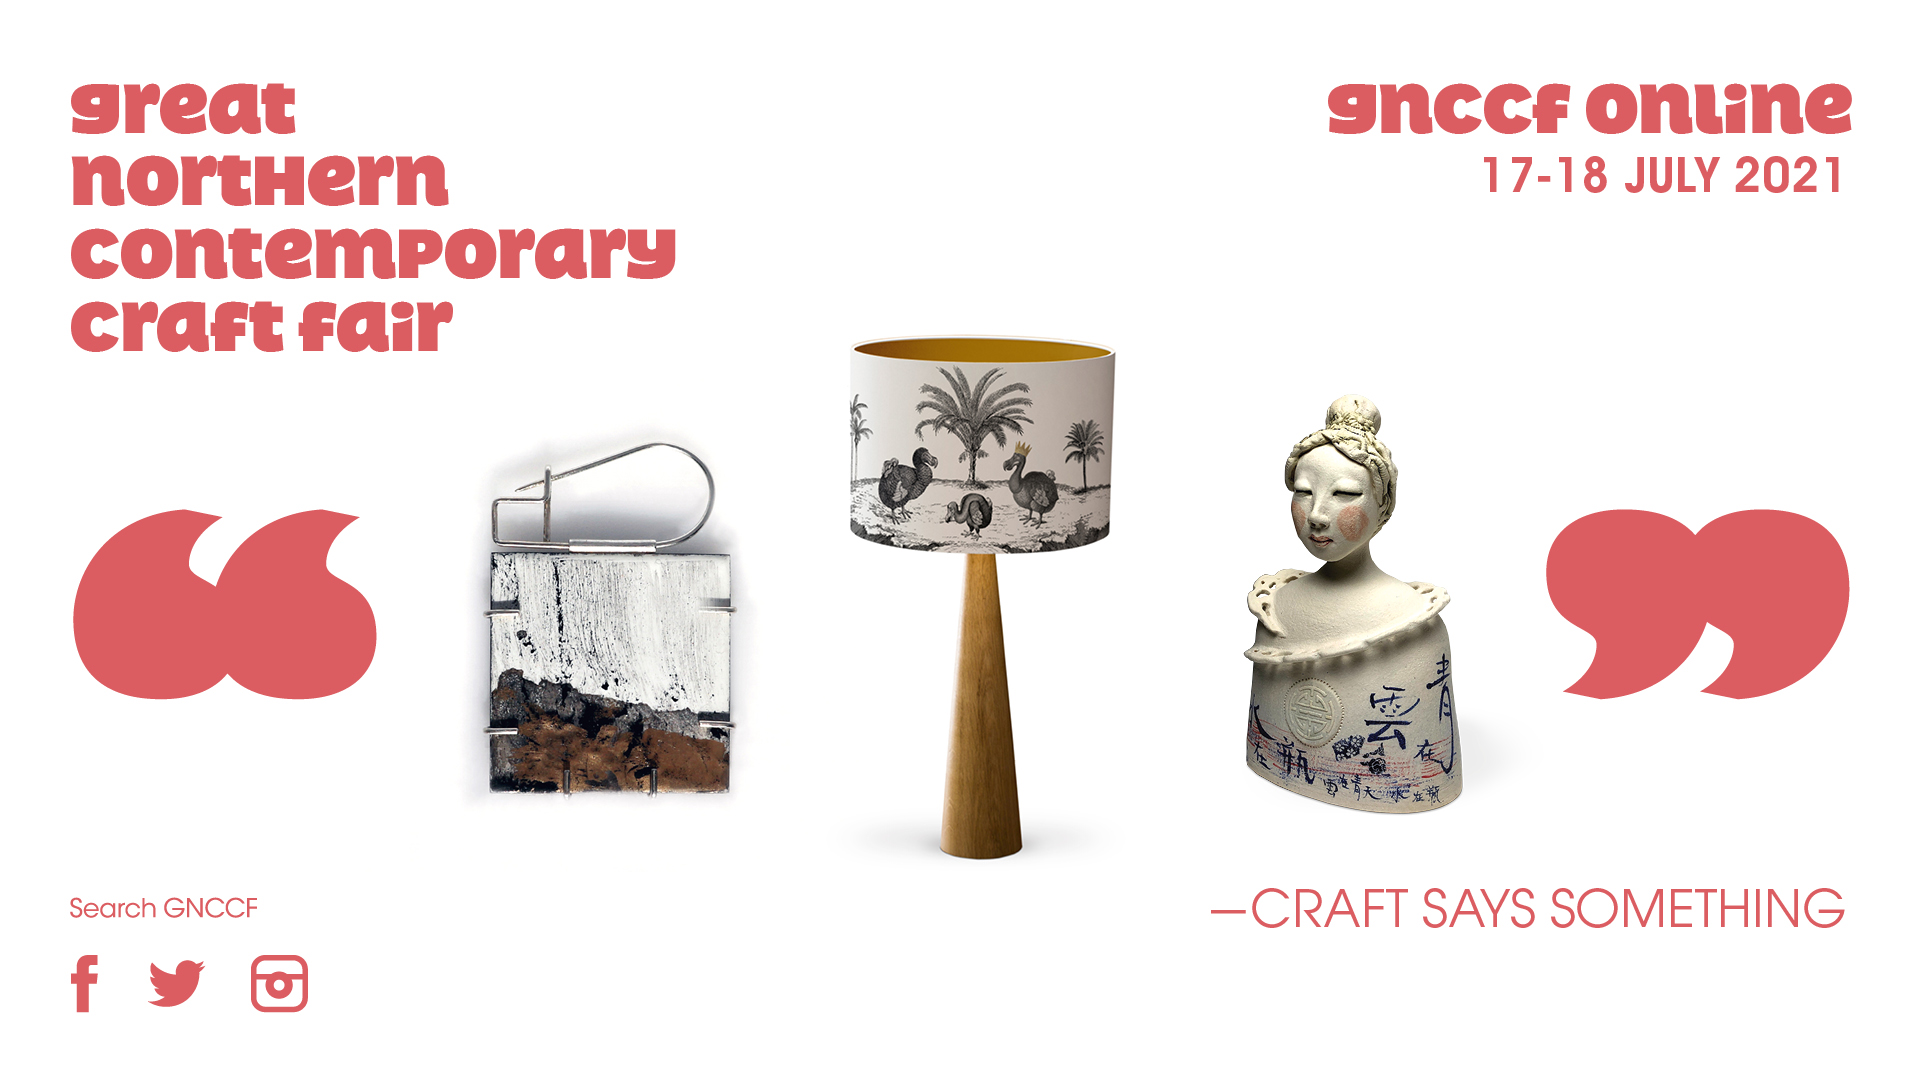 Great Northern Contemporary Craft Fair : GNCCFonline Summer Edition